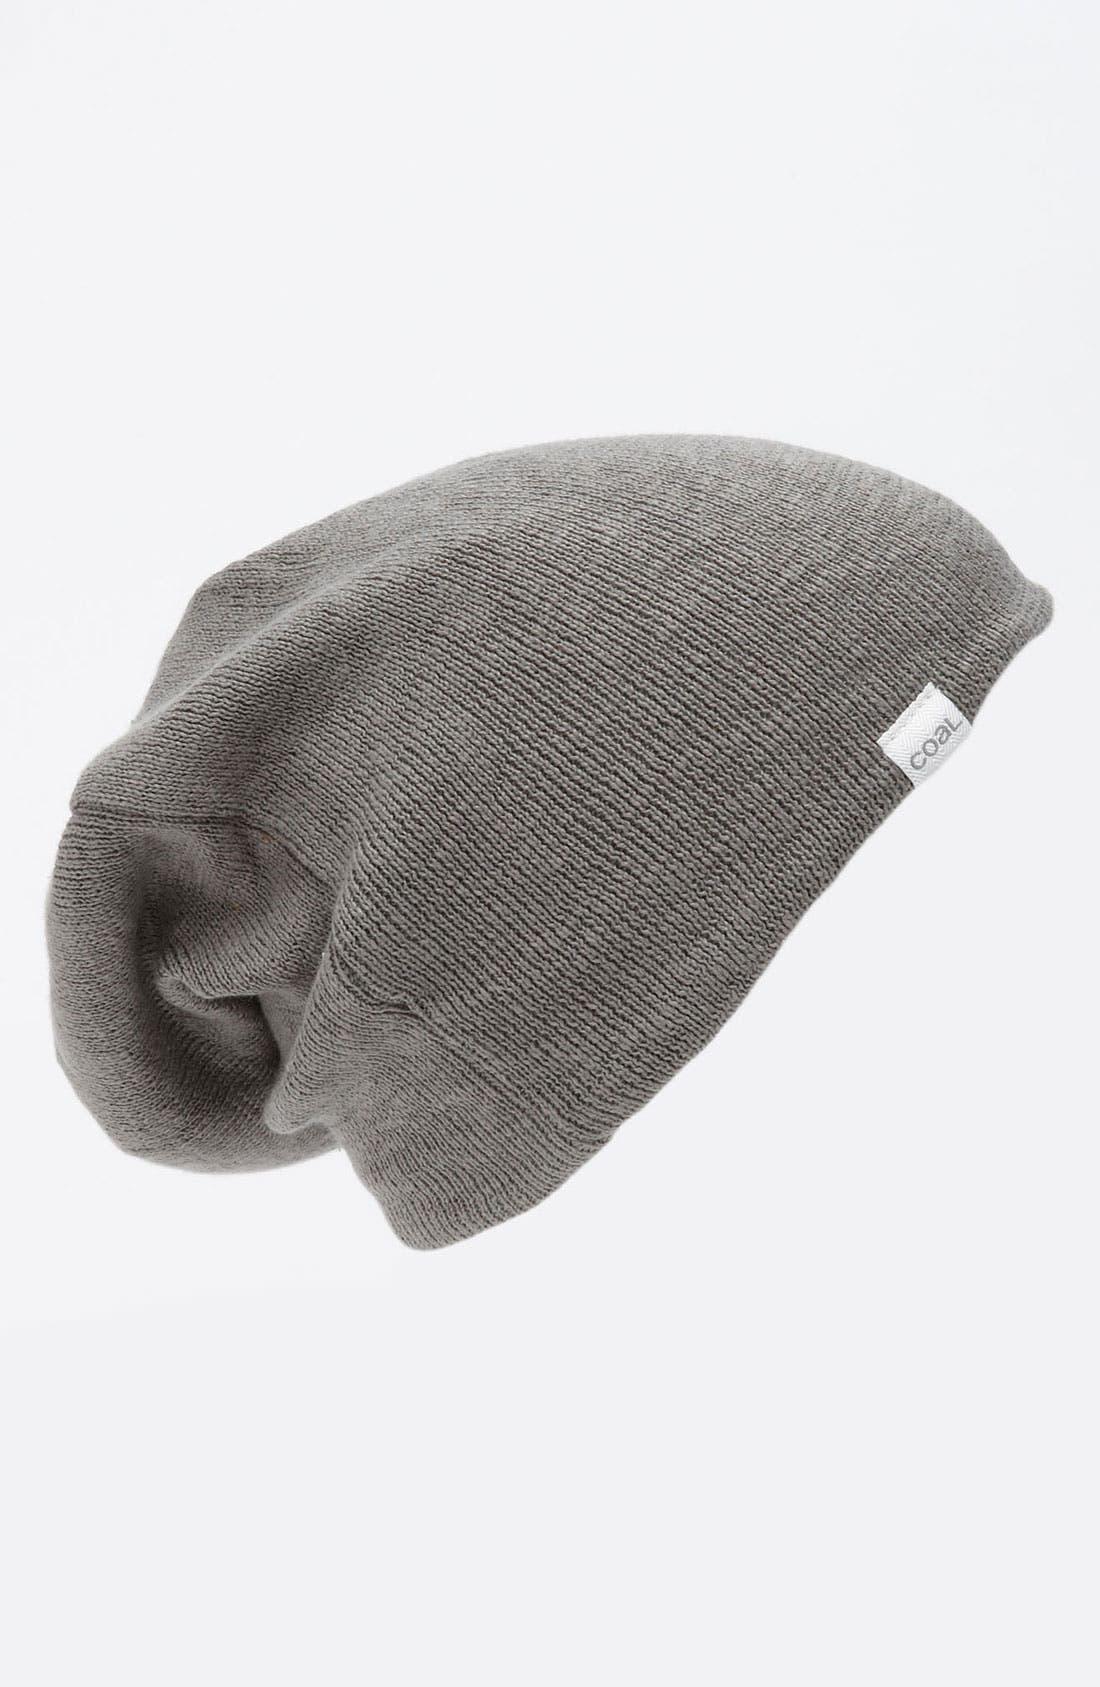 Main Image - Coal 'The Fields' Knit Cap